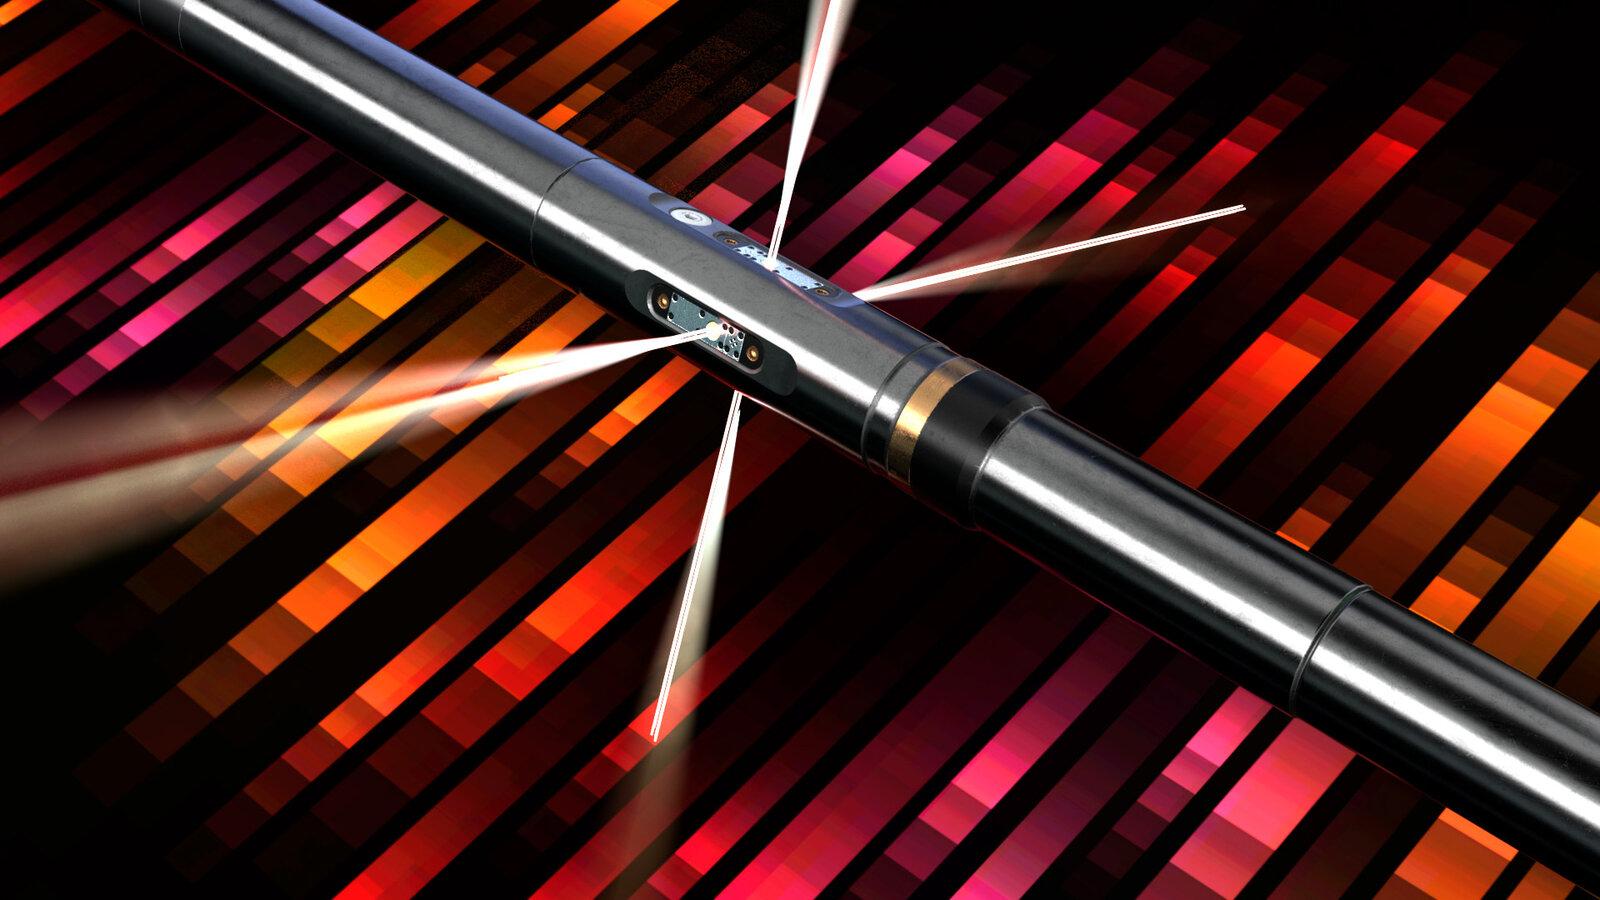 PixStar™ High-Resolution Ultrasonic Imaging Service